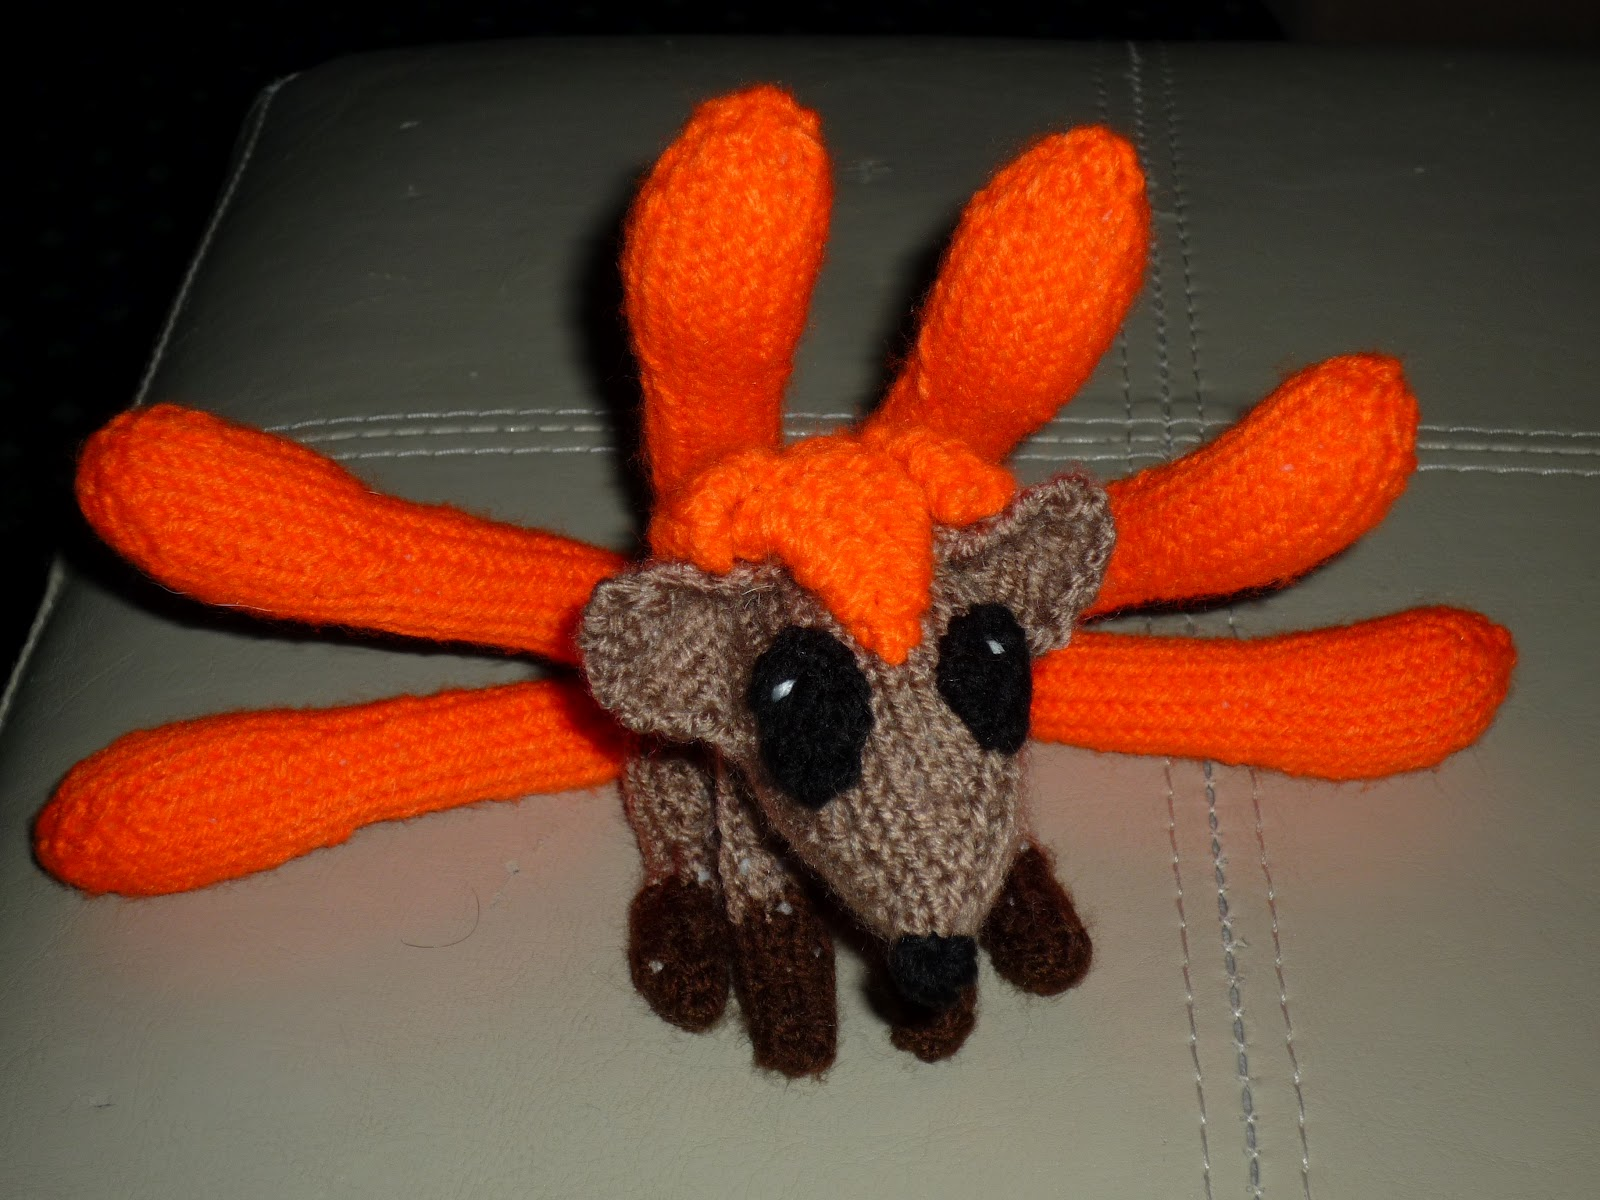 Abbreviation Kfb In Knitting : Marmokachi s vulpix